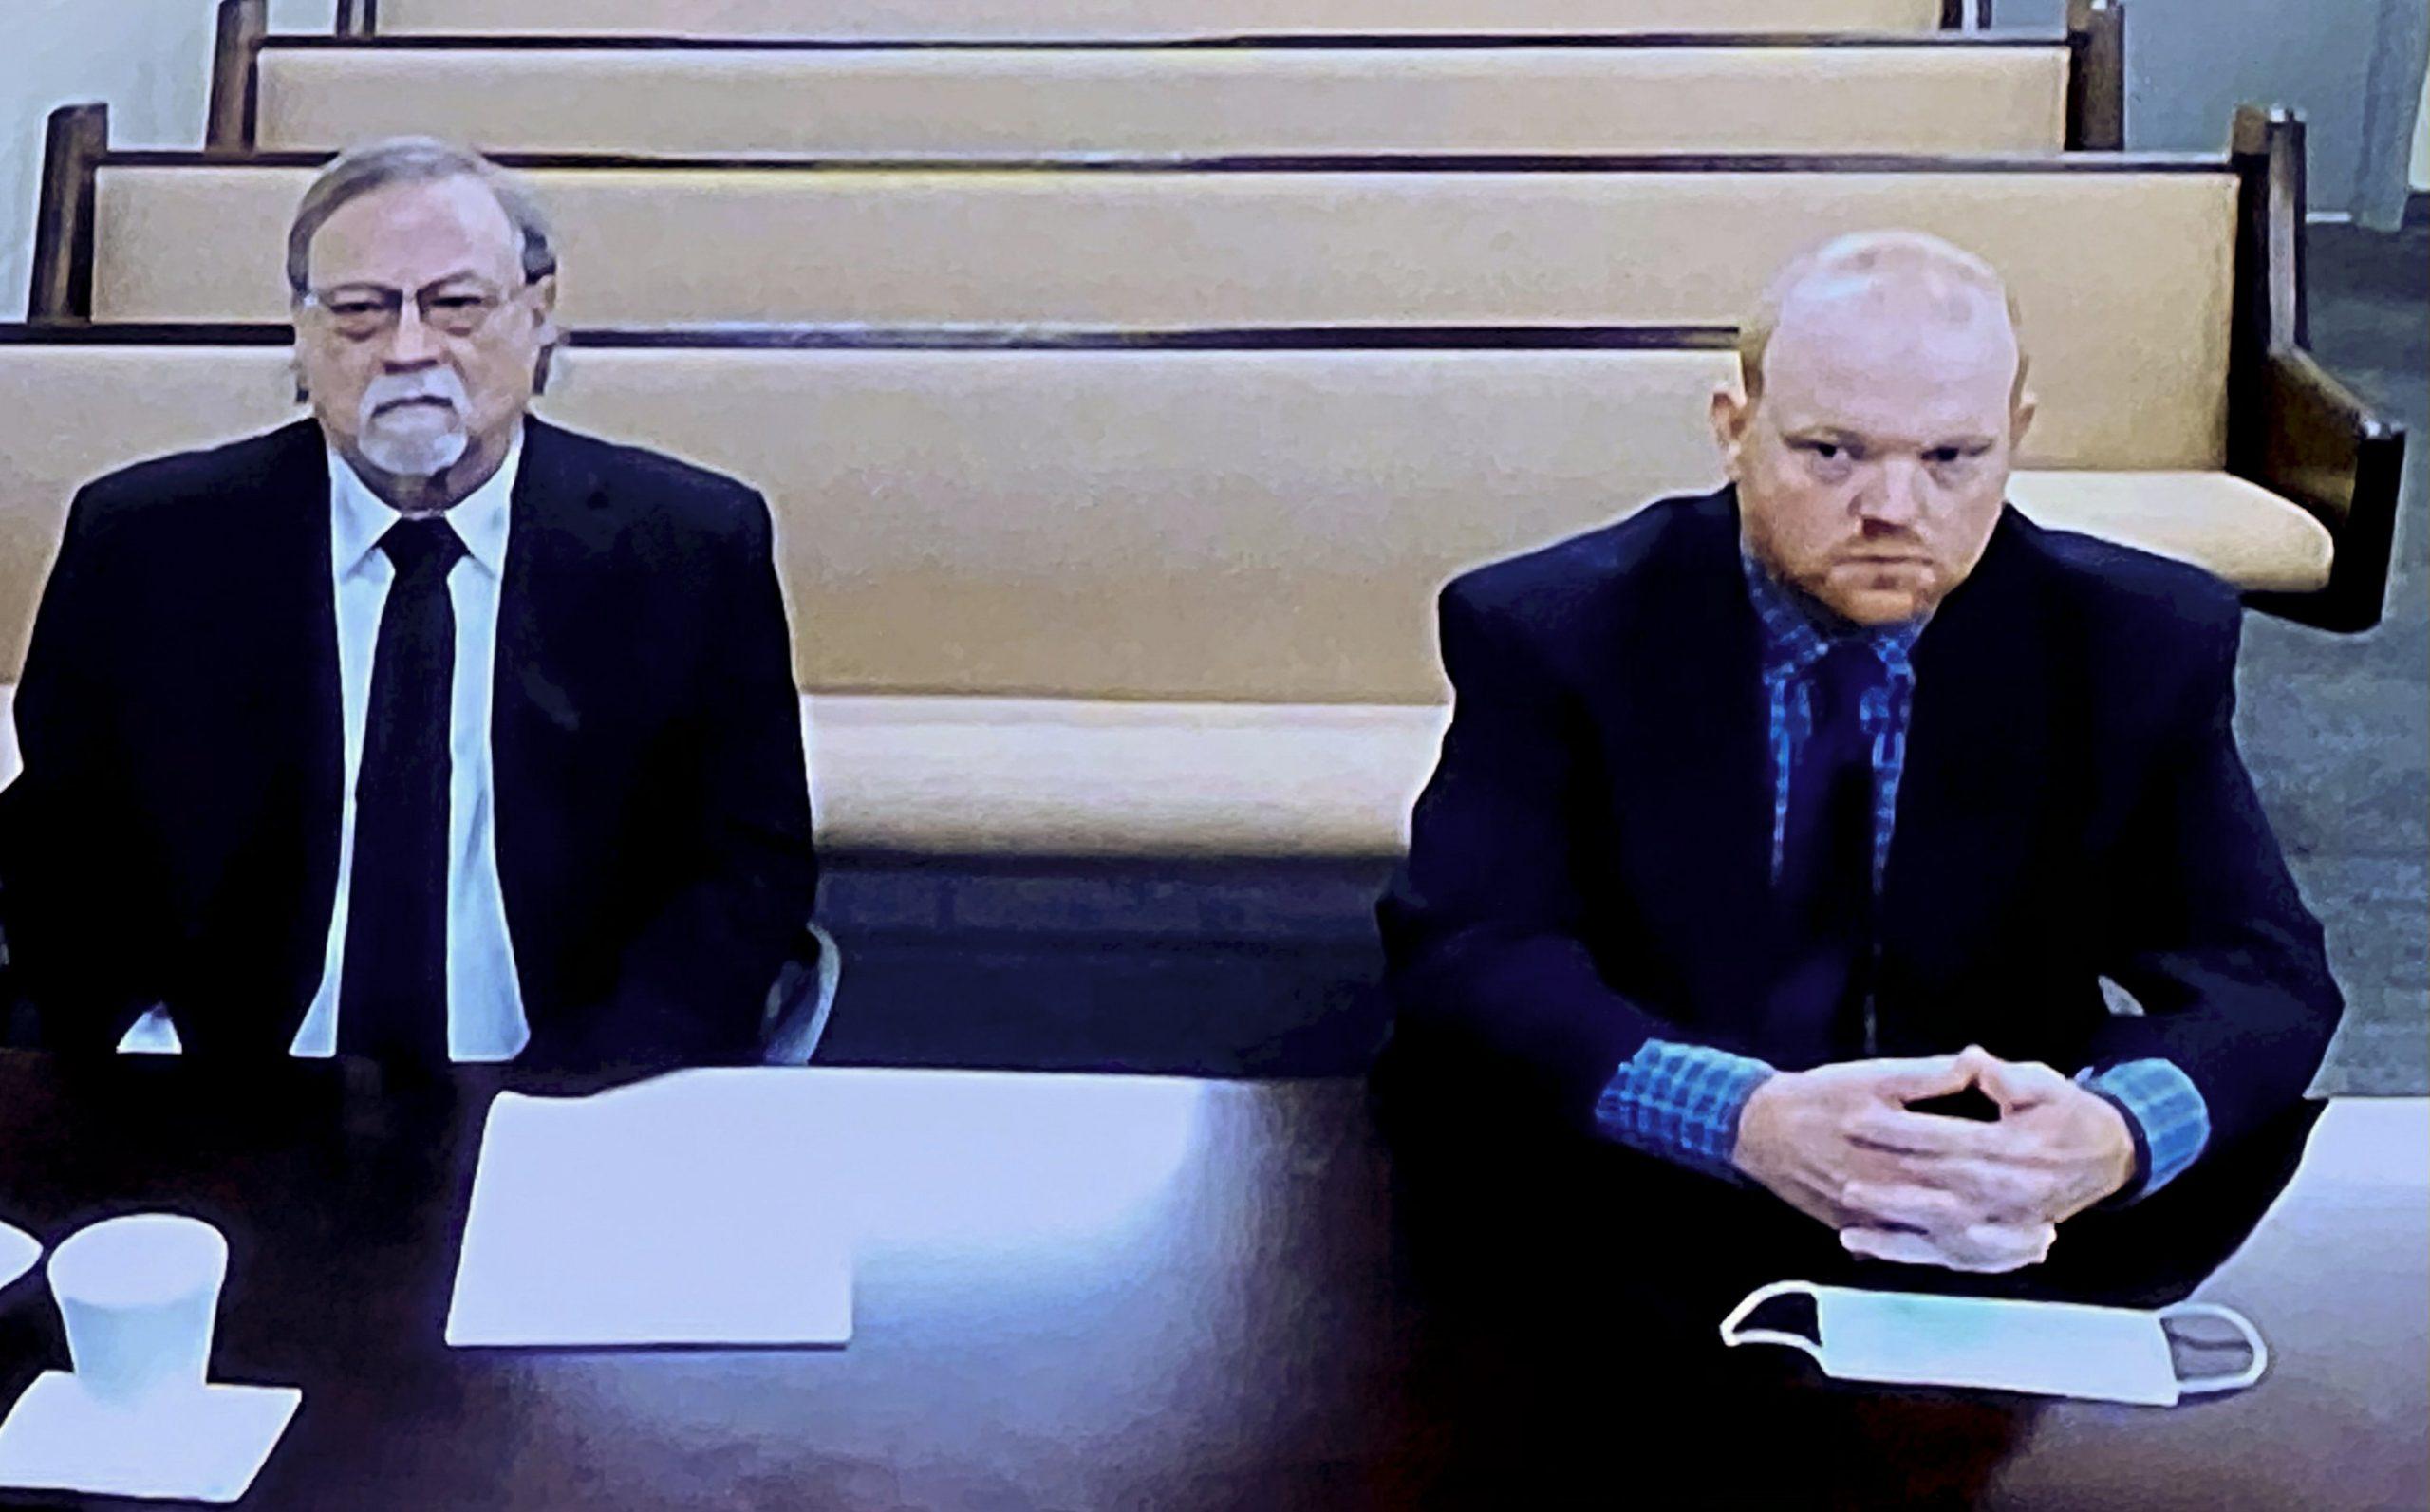 Prosecutor Ahmed Arbery reads the racist news of the killer